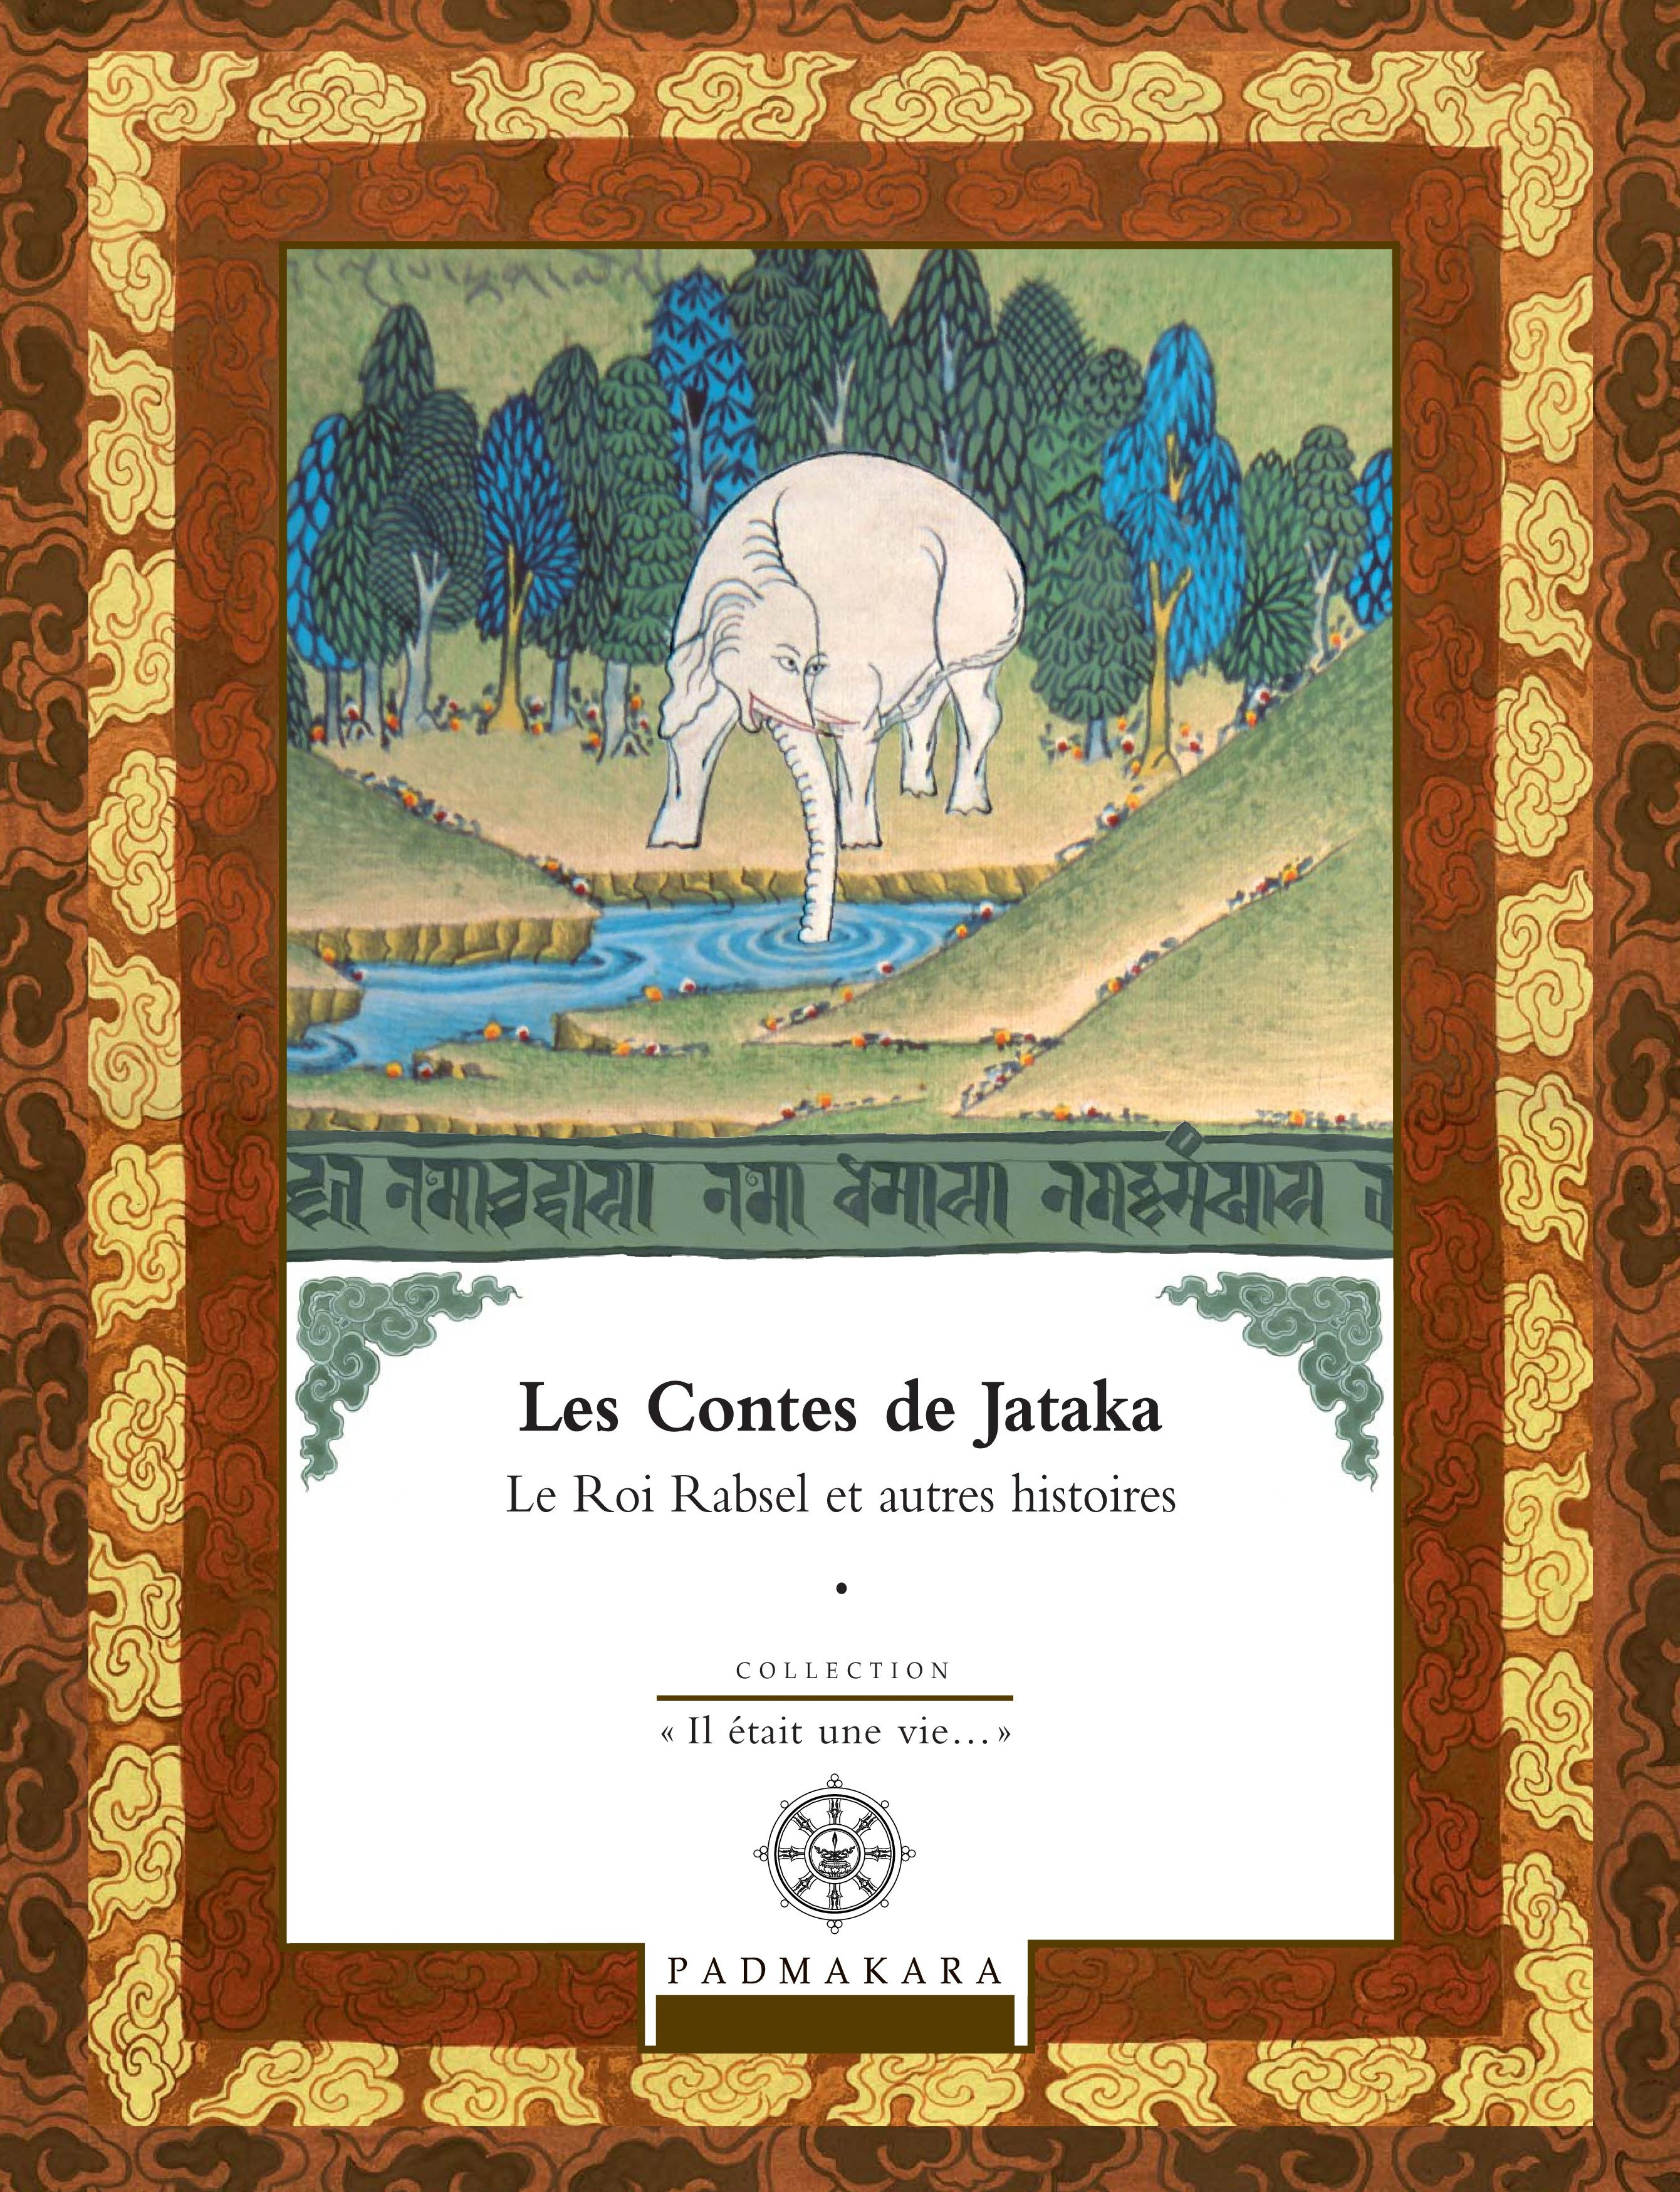 Collectif Contes de Jataka - Volume II